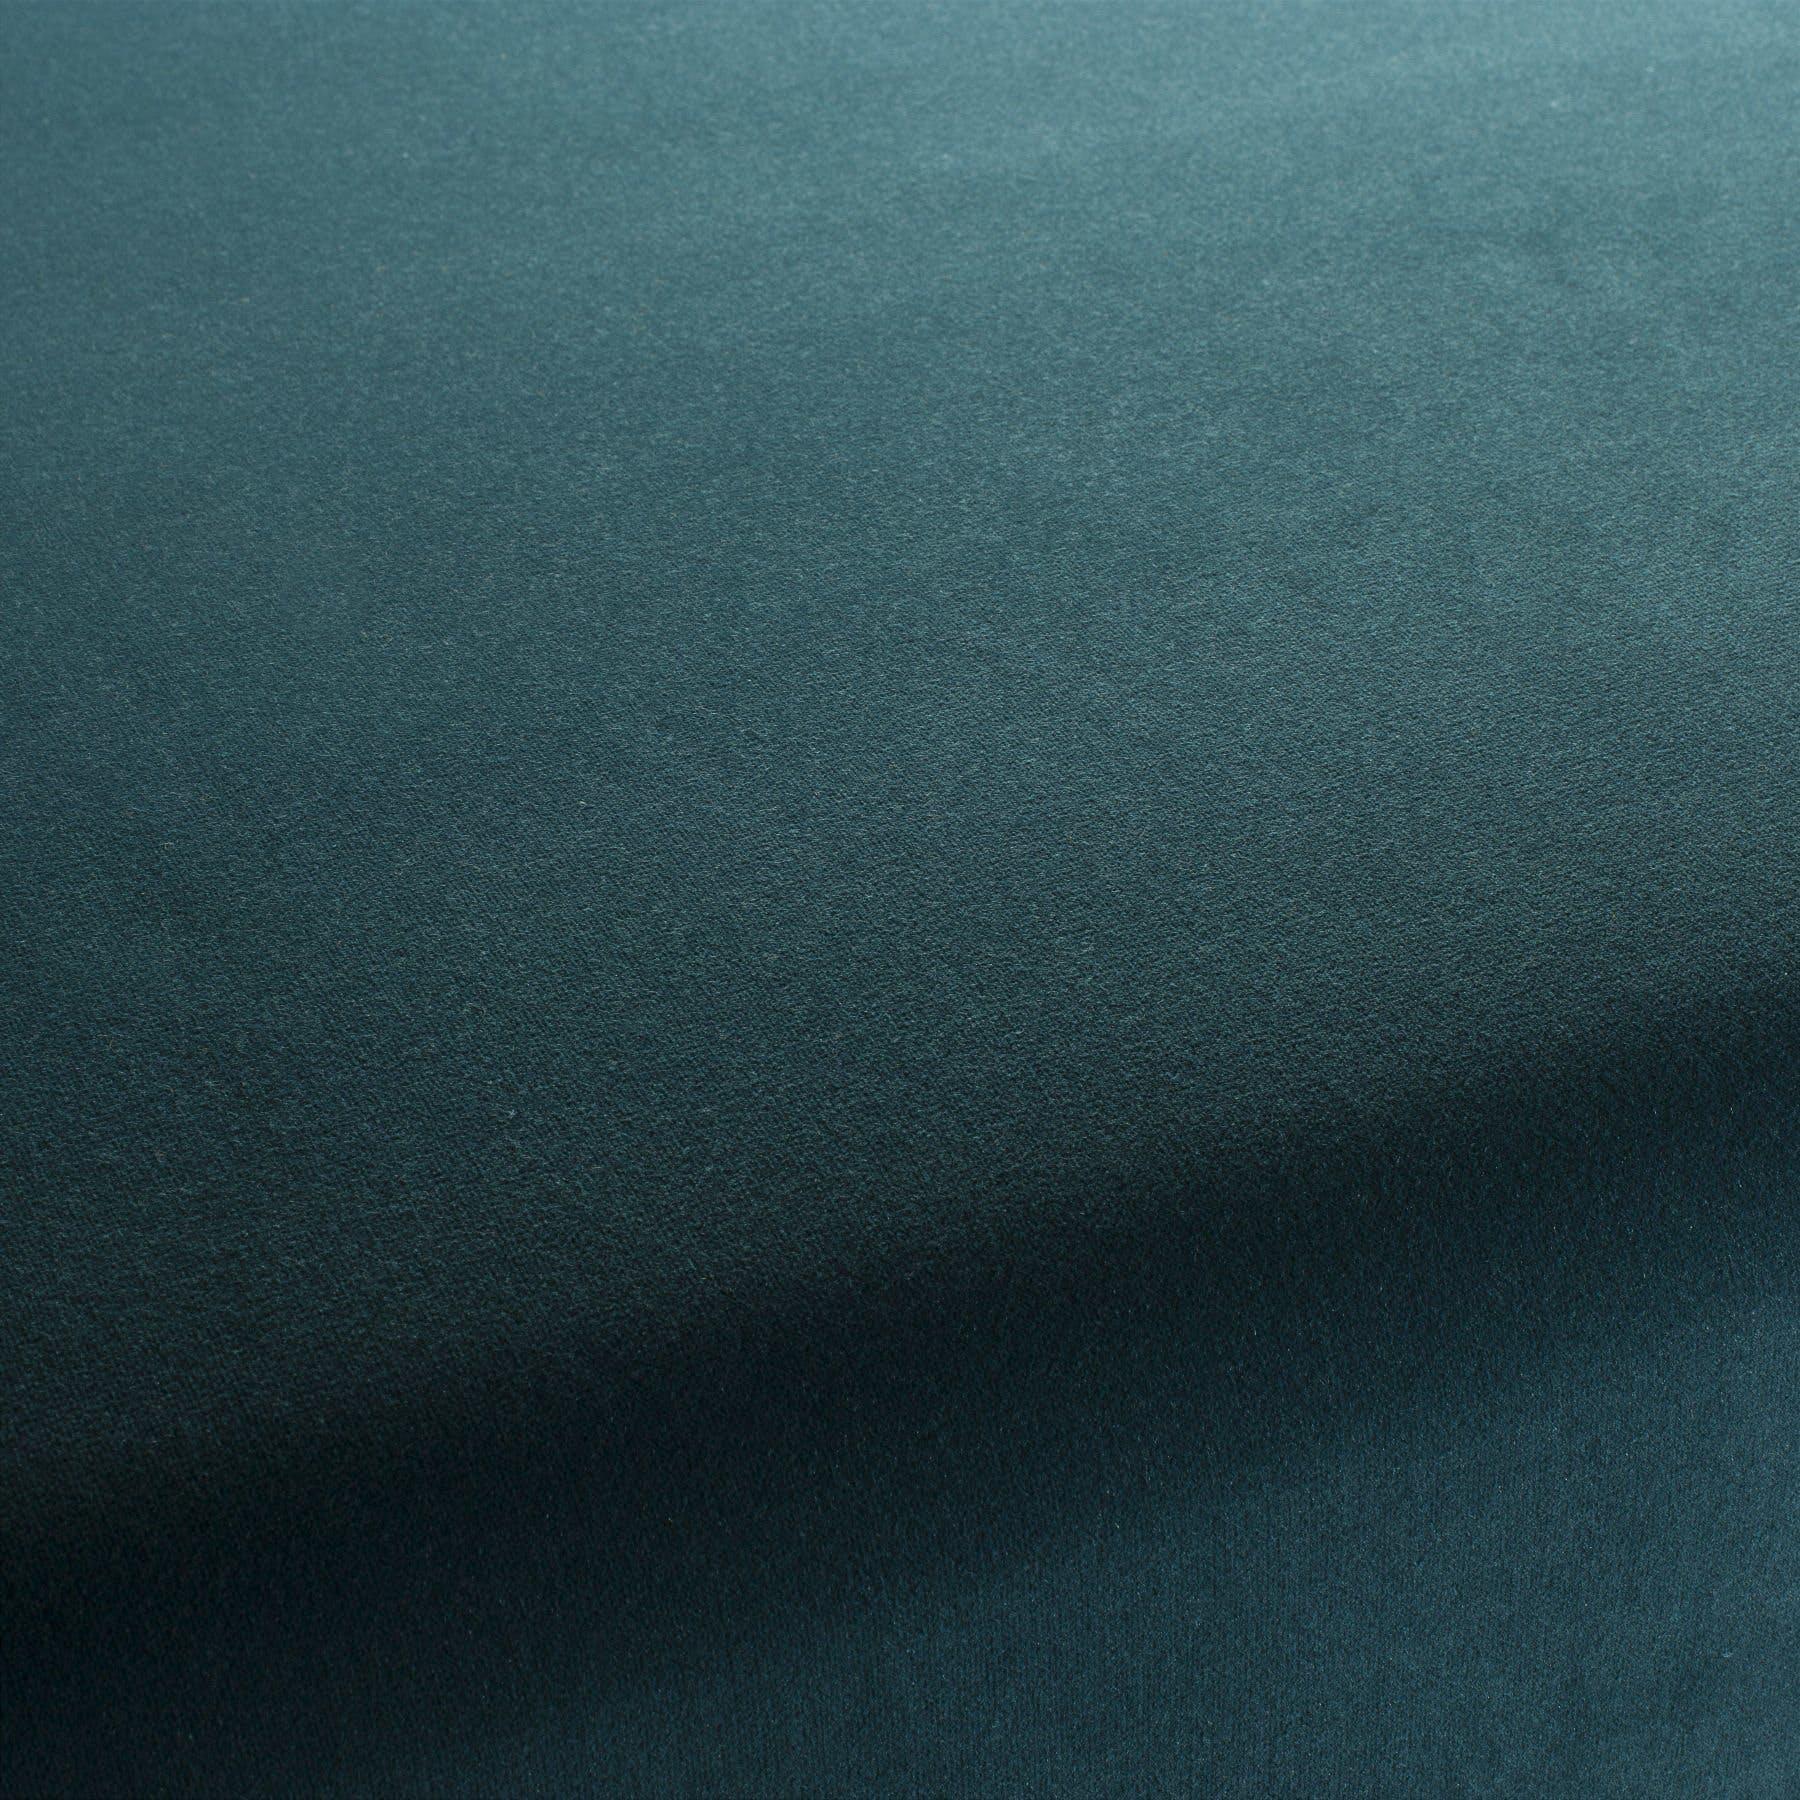 Jab-anstoetz-fabrics-teal-velluto-upholstery-haute-living